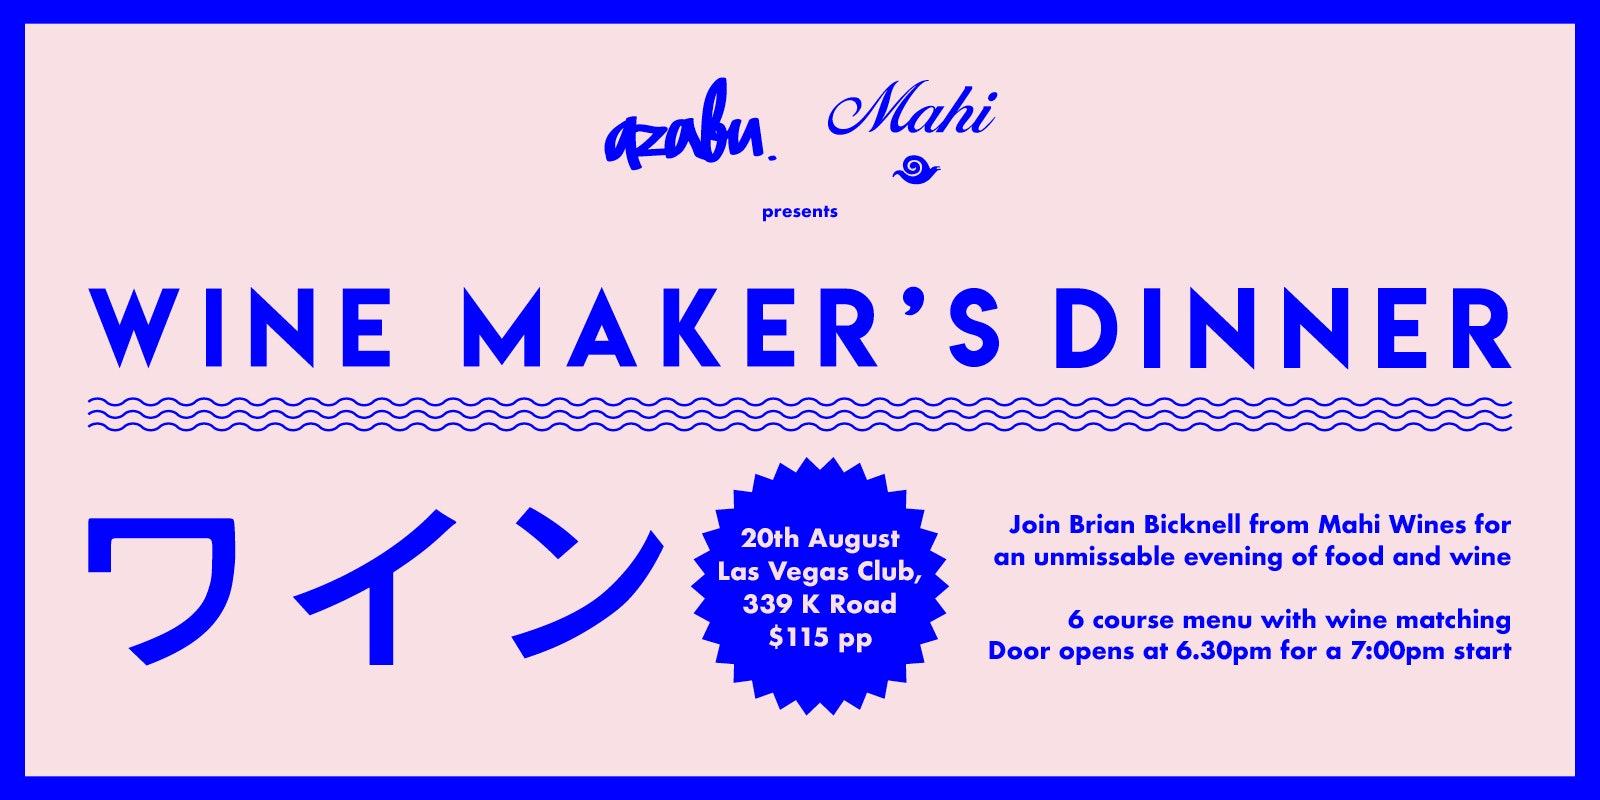 Azabu and Mahi Wine Maker's Dinner